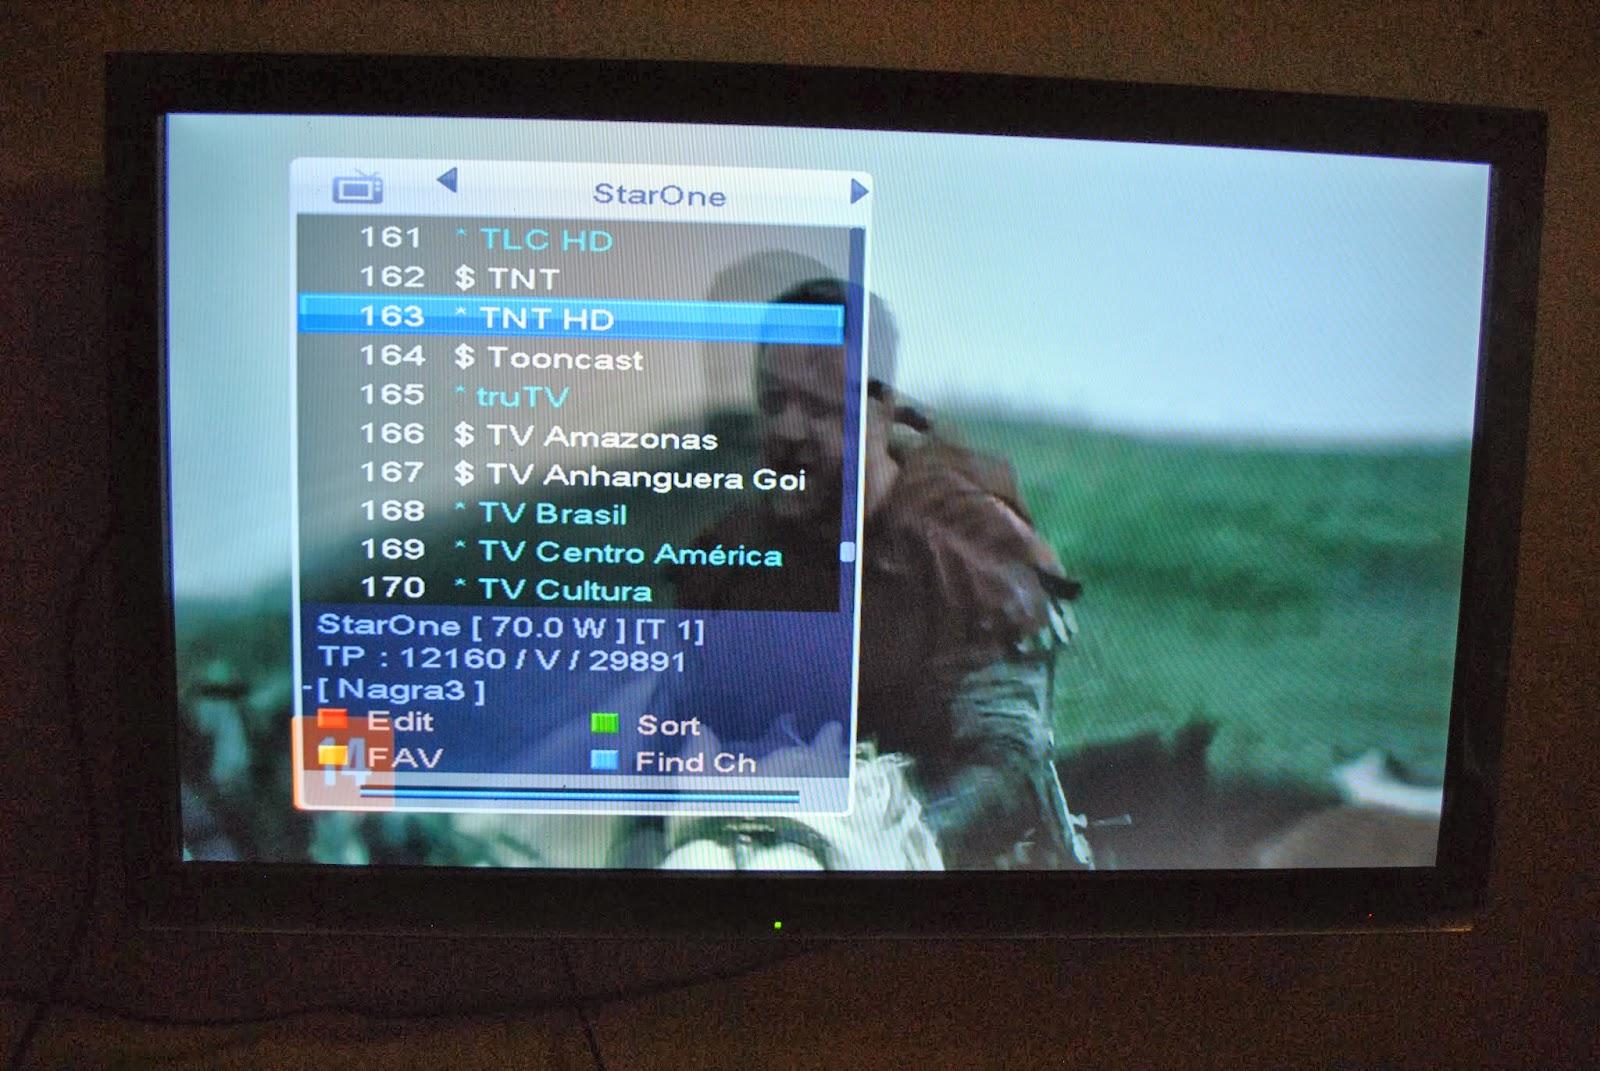 Superbox Tv Apk